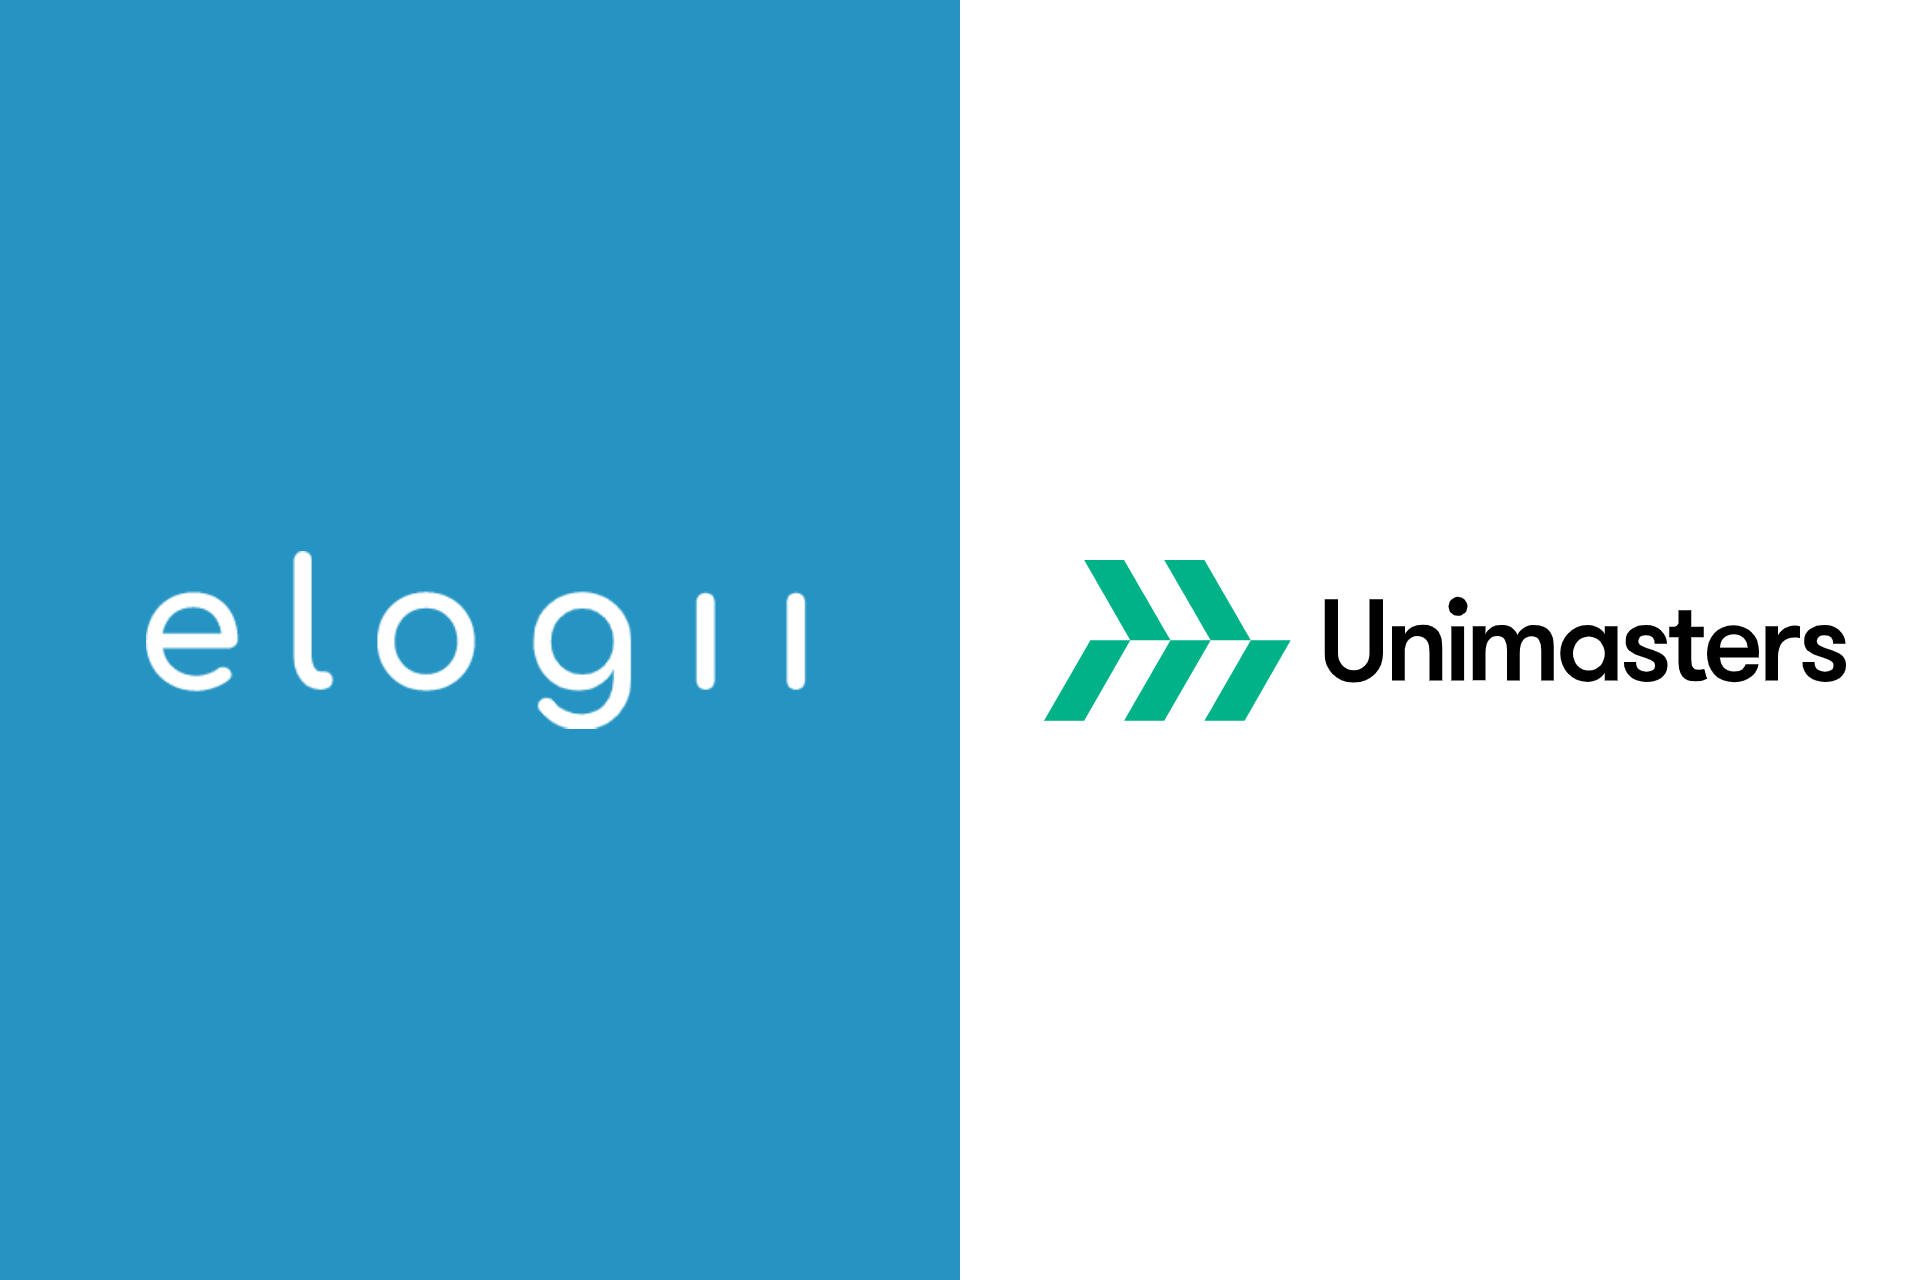 Unimasters chooses eLogii, the leading next generation Delivery Management platform